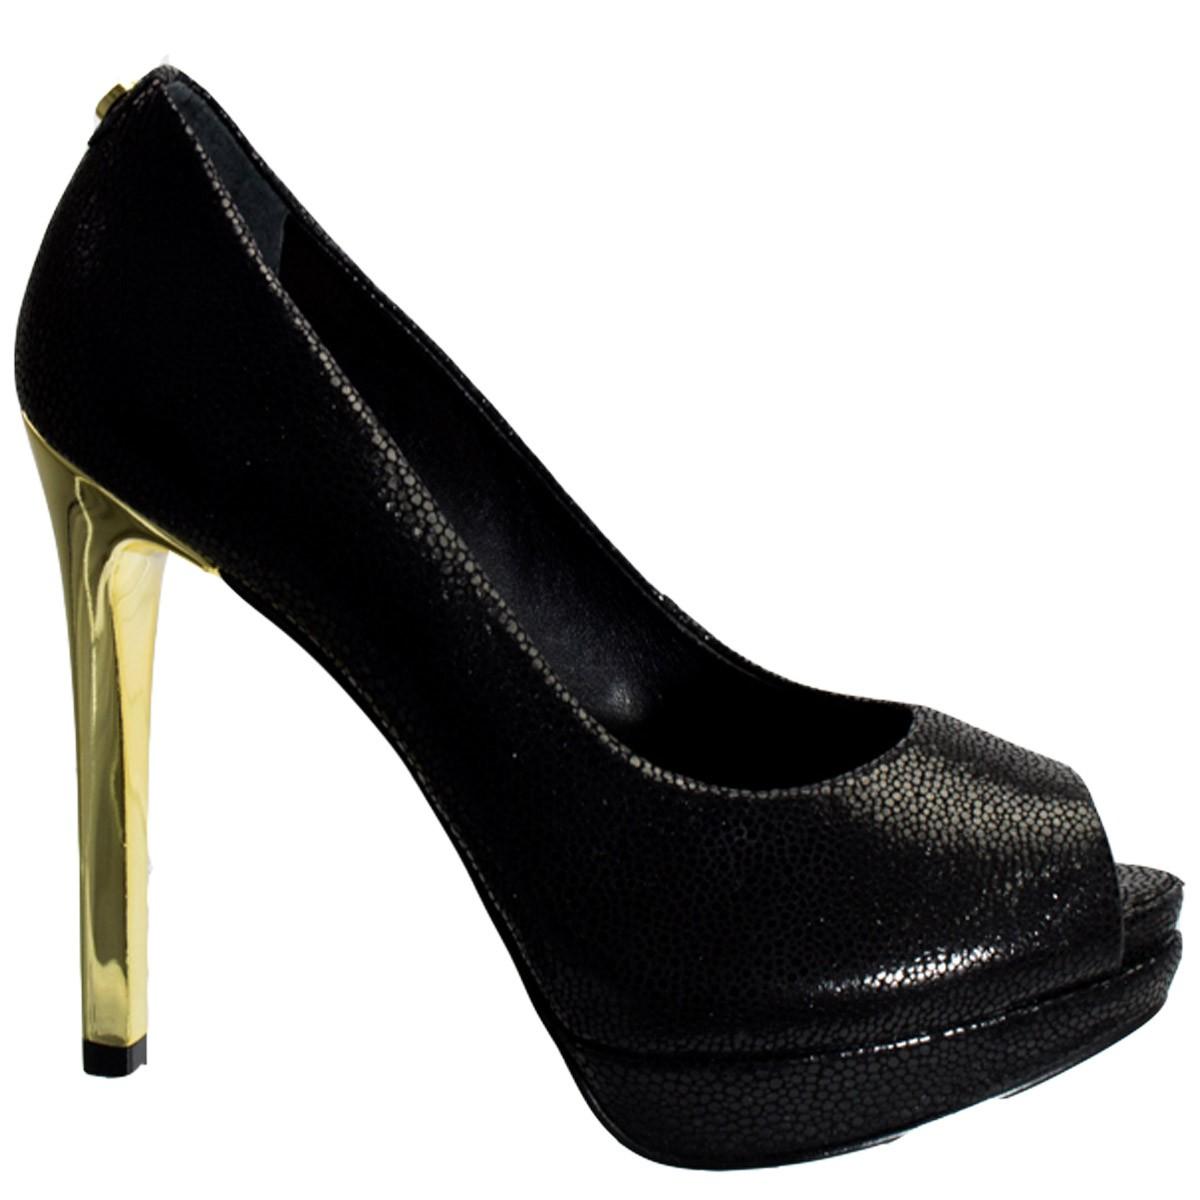 bf7277a2a8 Bizz Store - Sapato Peep Toe Feminino Jorge Bischoff Preto